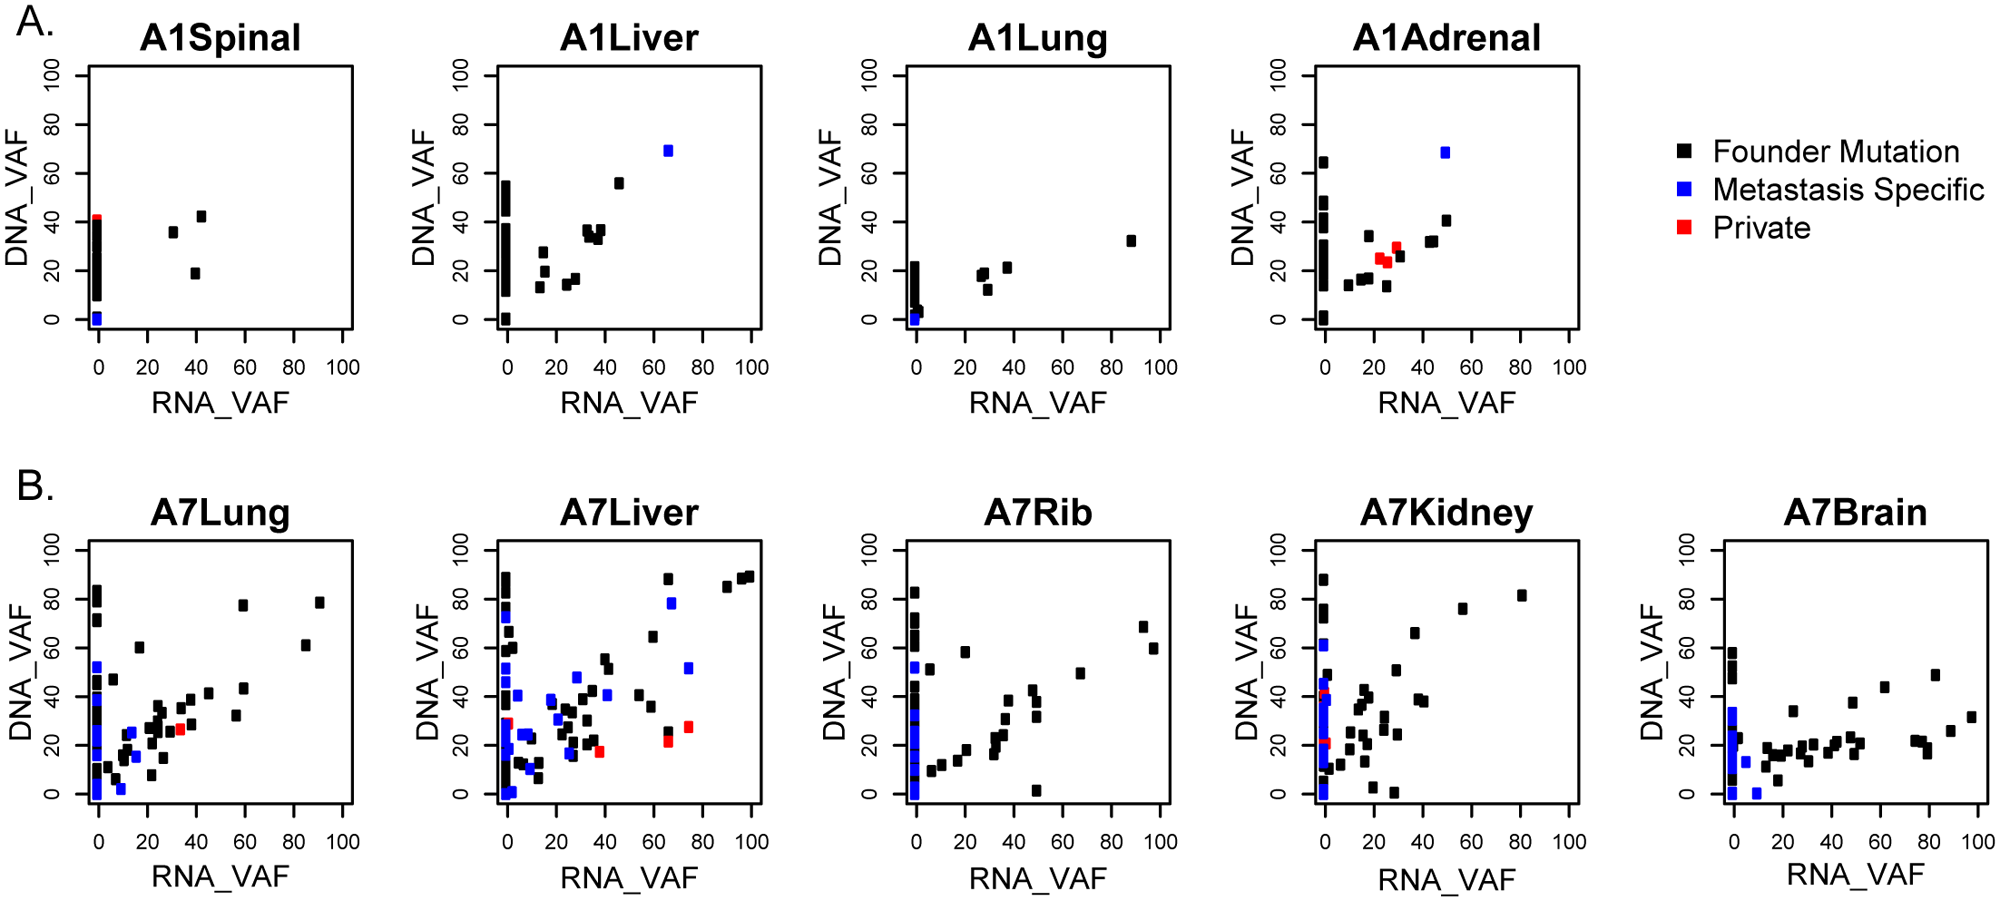 Gene expression of variant alleles.